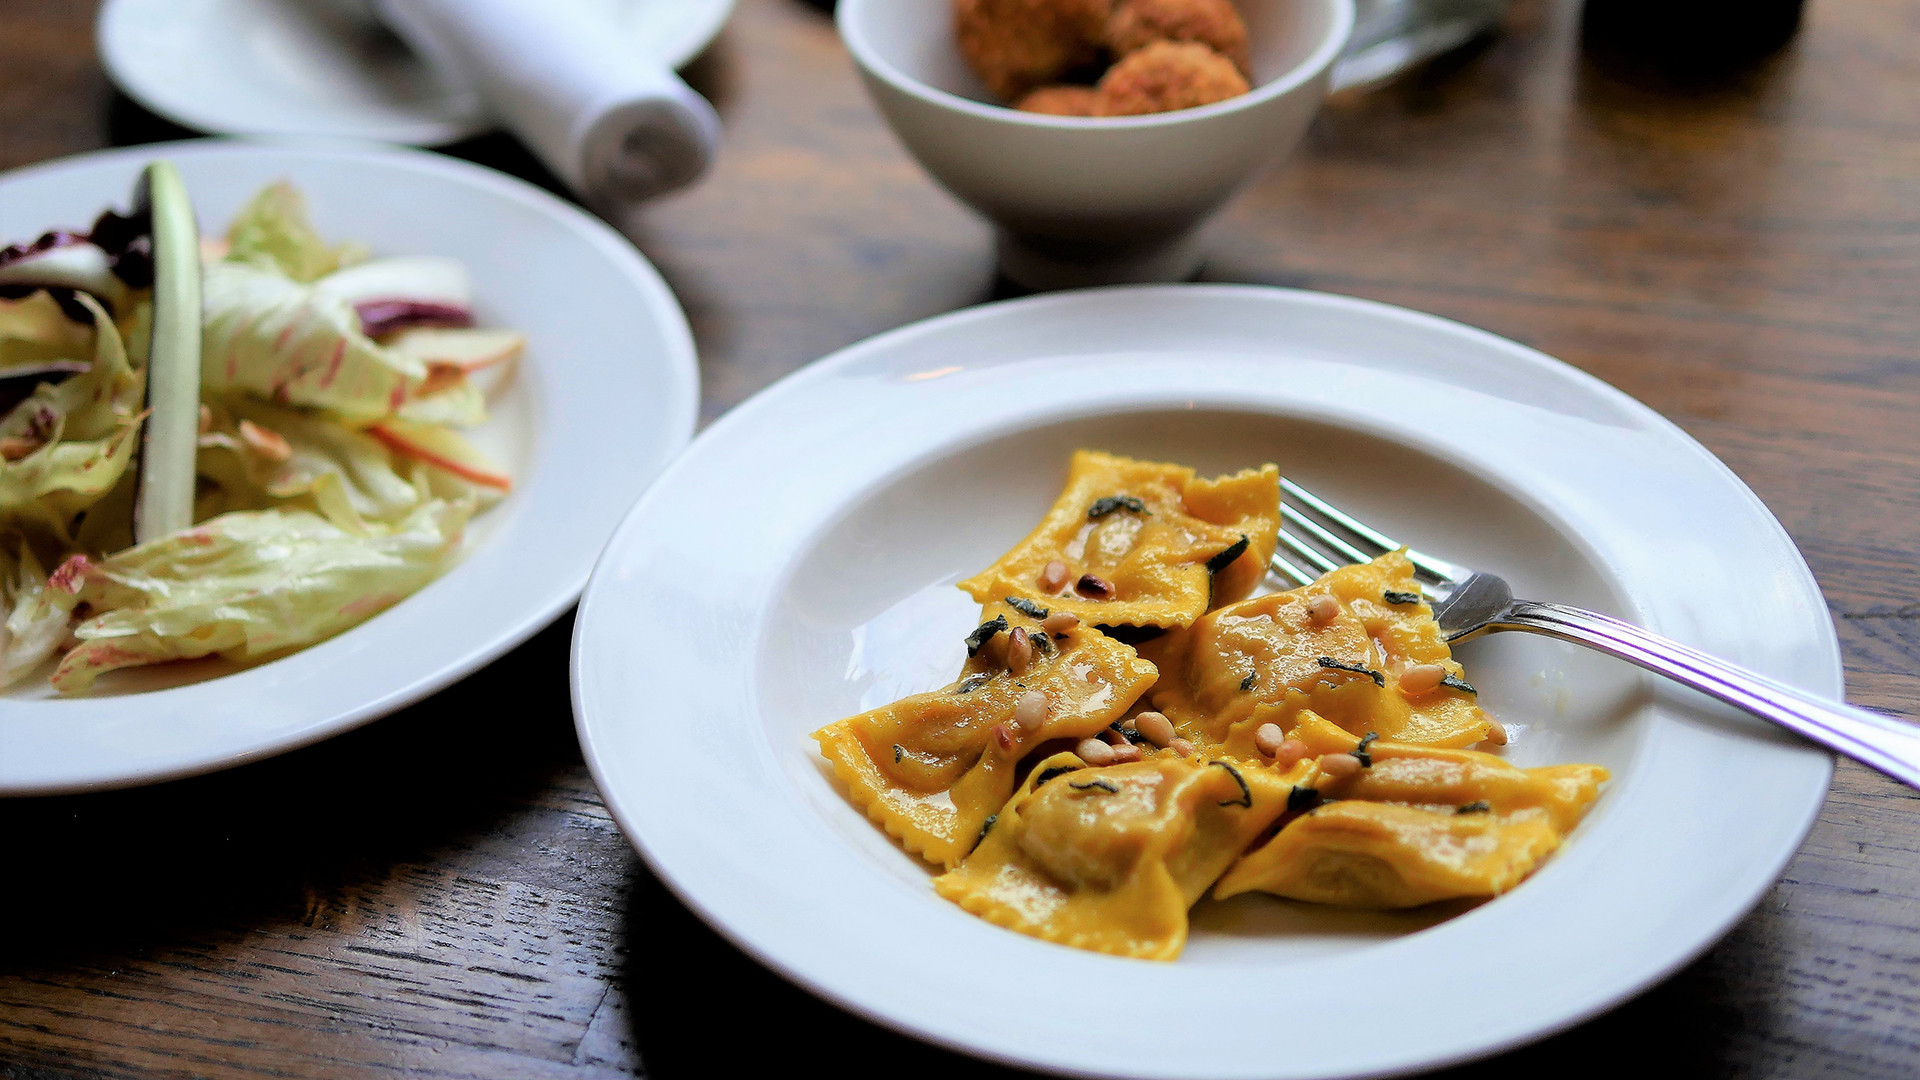 Best pasta restaurants in London – Cafe Murano